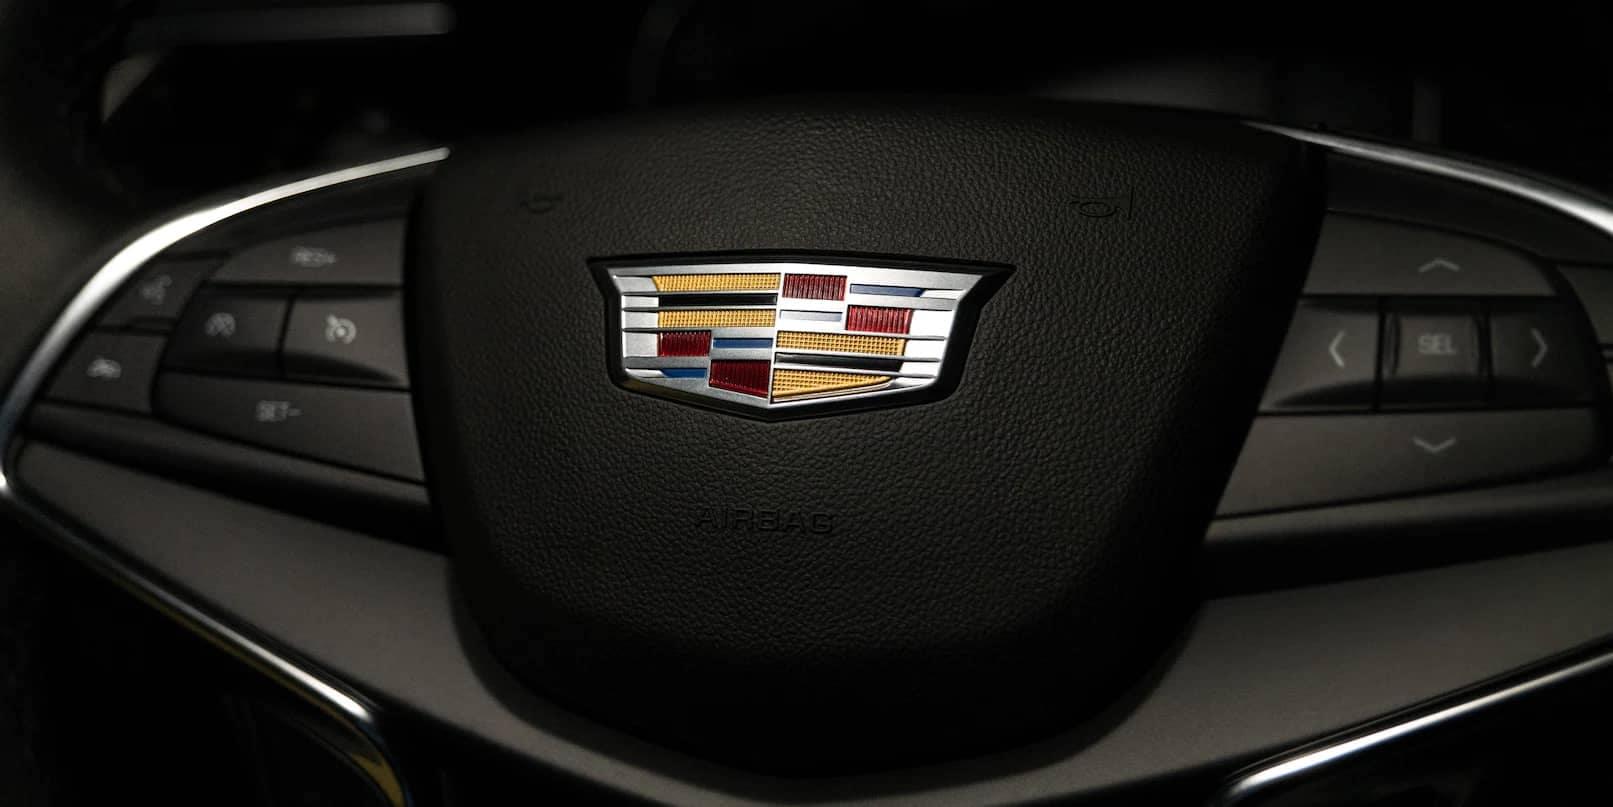 2021 Cadillac XT5 steering wheel with emblem